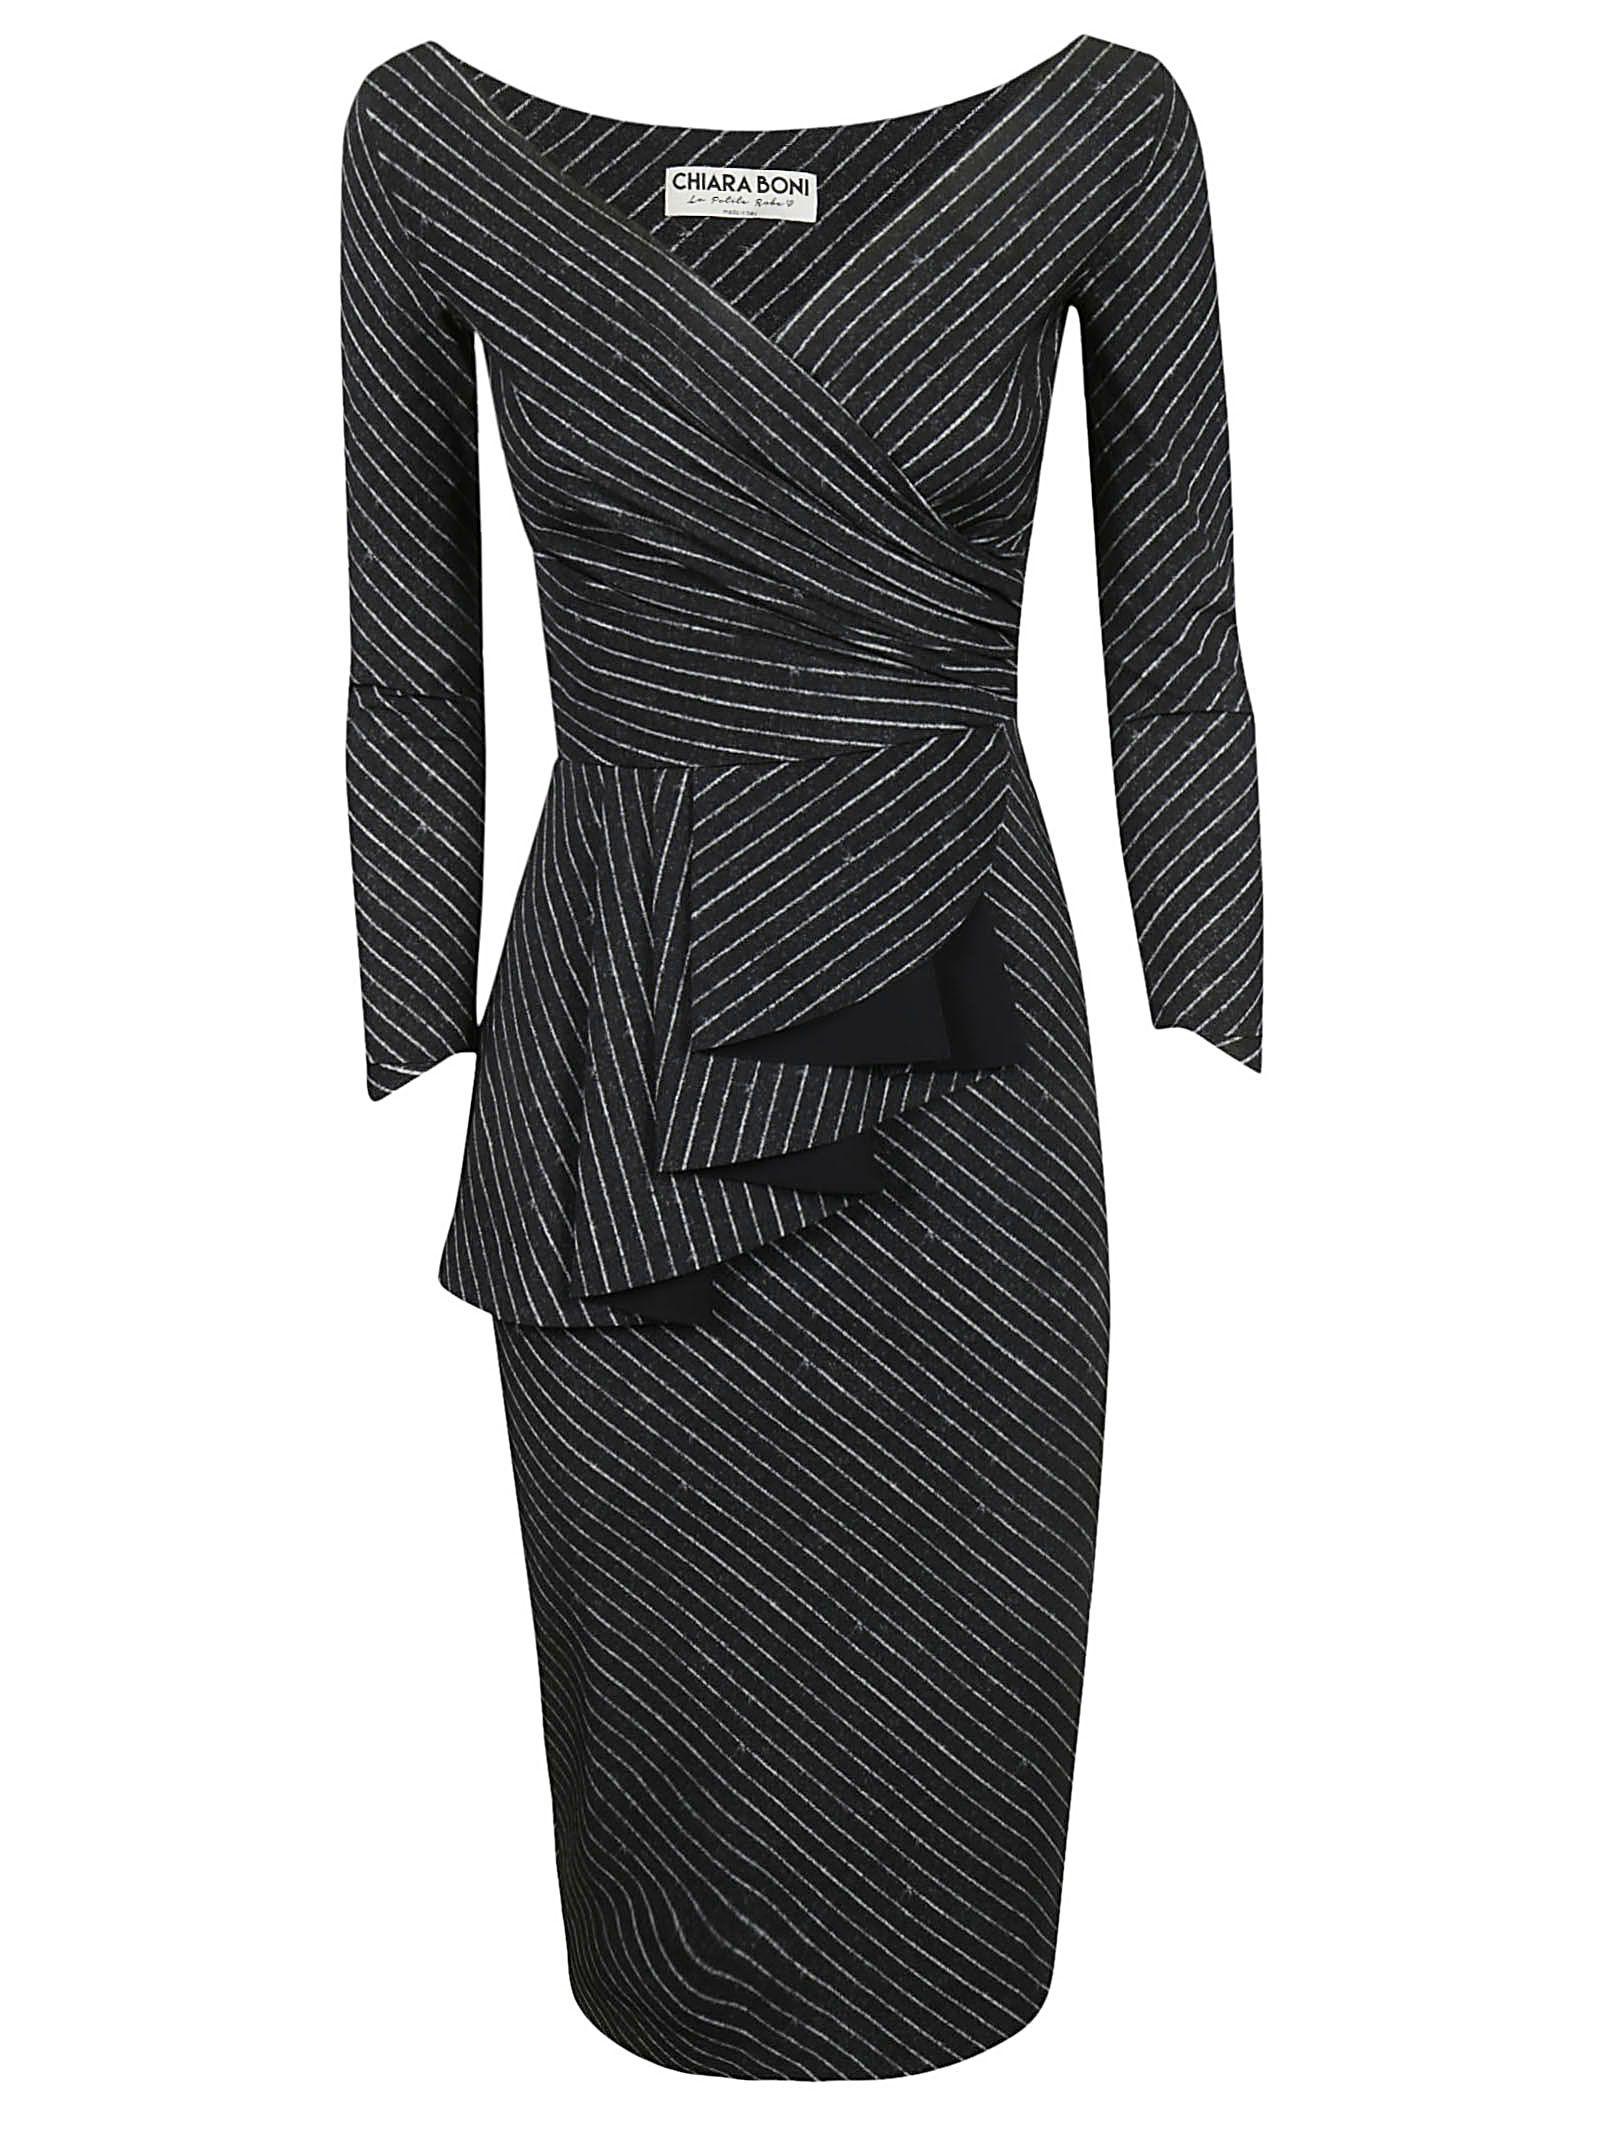 LA PETIT ROBE DI CHIARA BONI Ariane Dress in Black/White